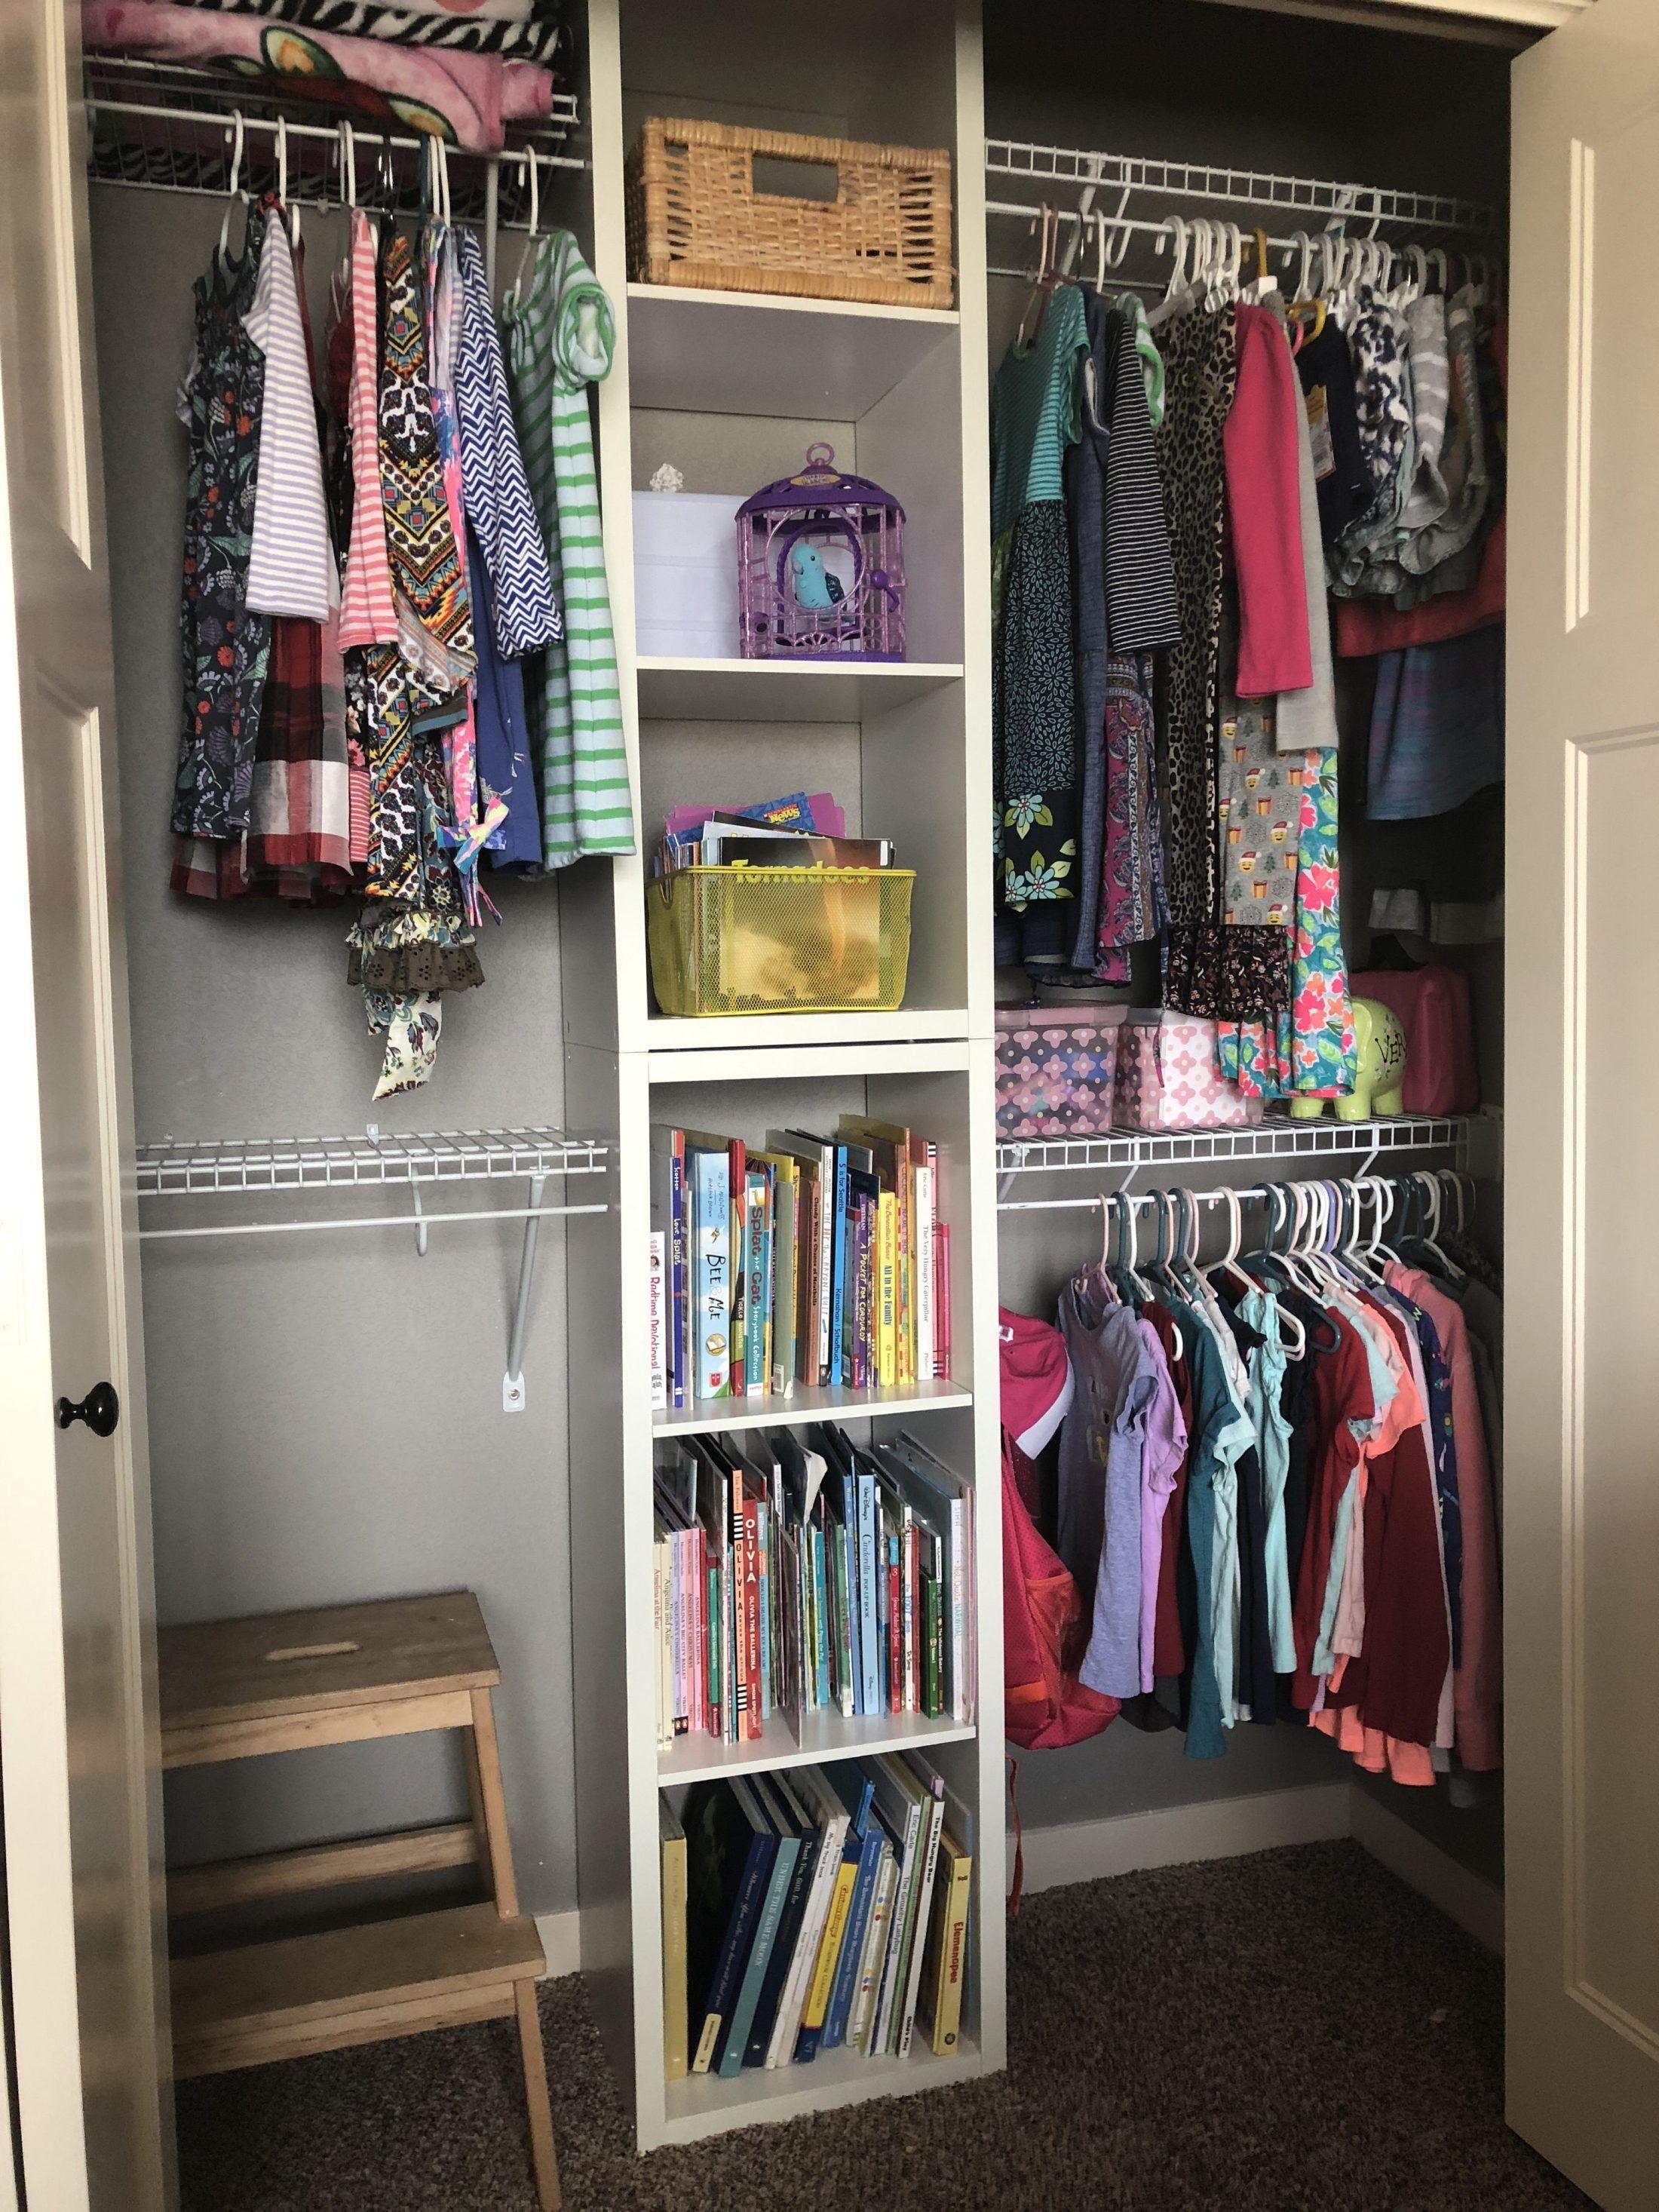 Shared Kids Closet Diy Organization System Bedroom Organization Closet Closet Small Bedroom Closet Organizing Systems